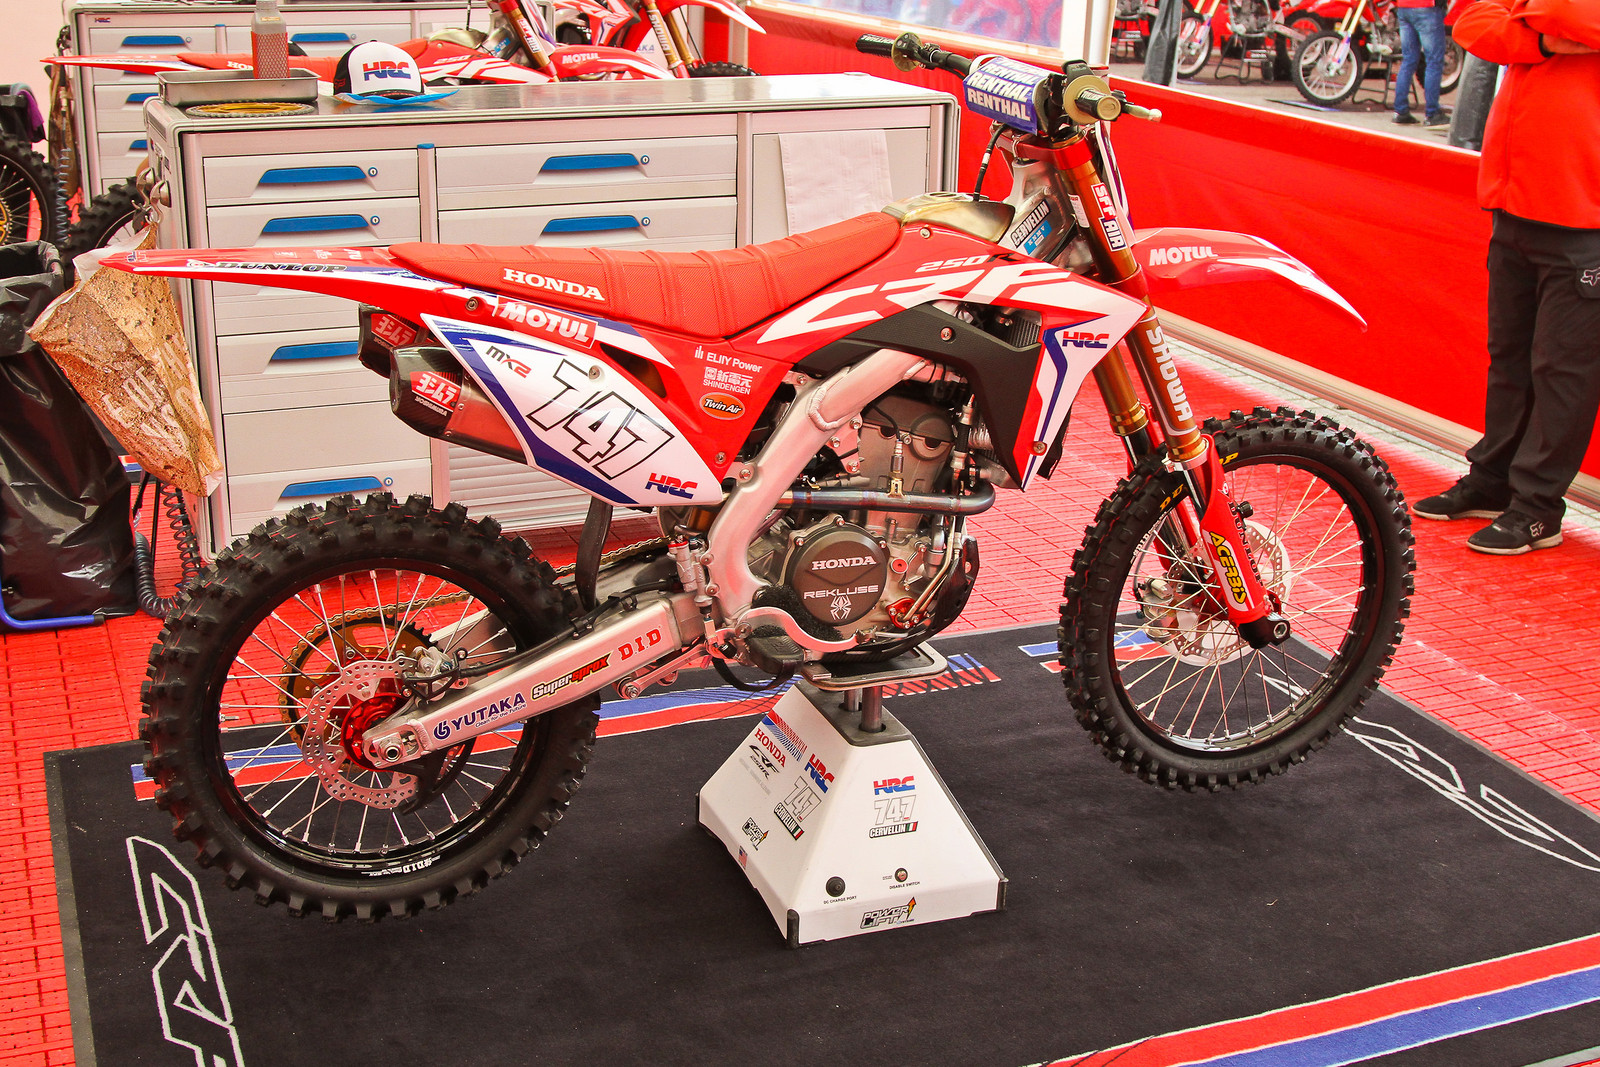 2018 Honda CR250RW - Right Side - ayearinmx - Motocross Pictures - Vital MX